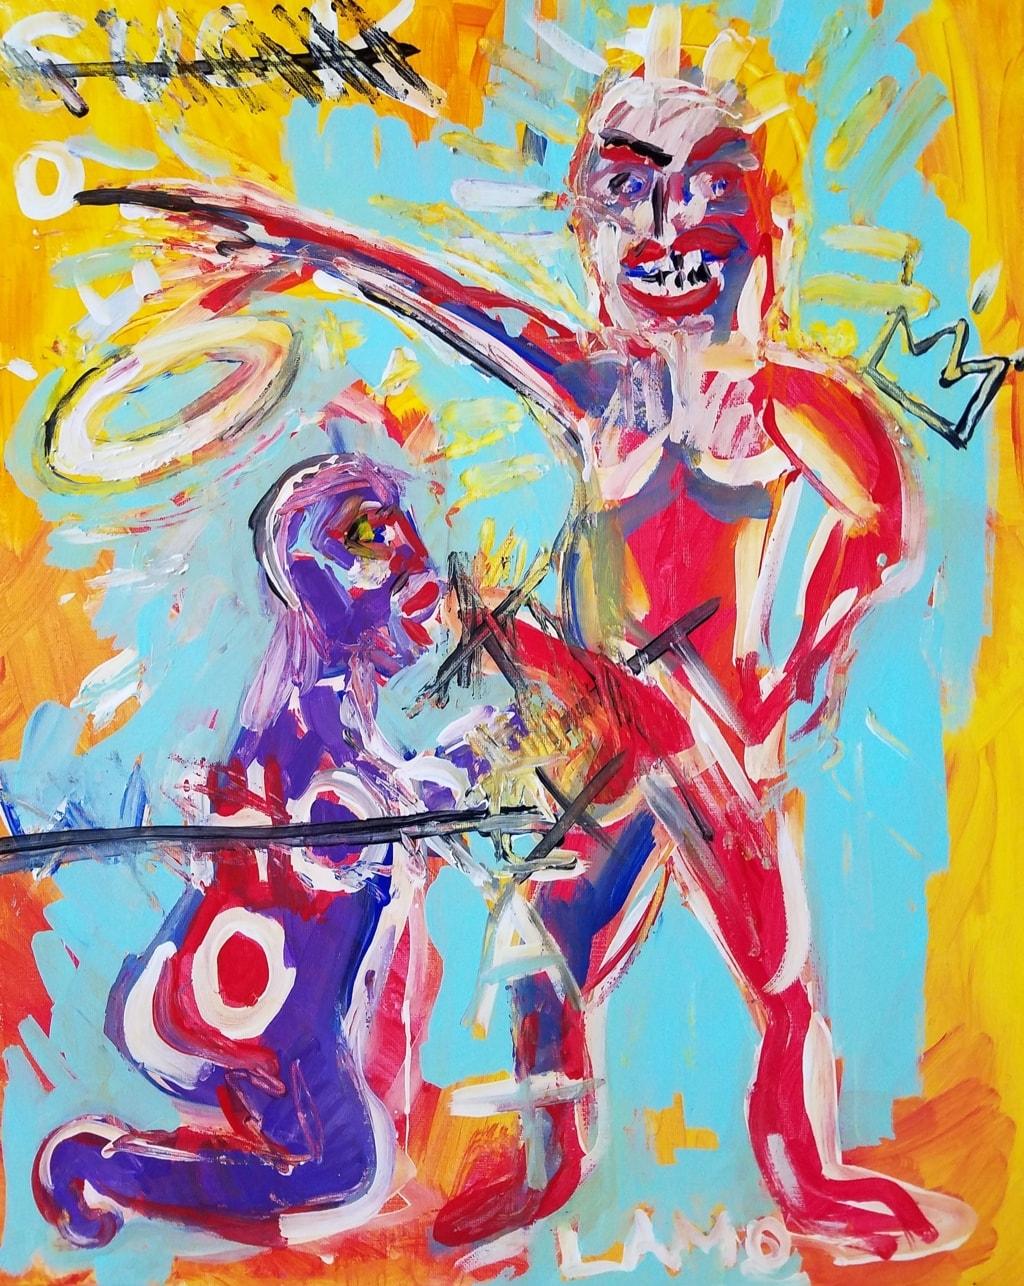 Series.. graffiti, expressionist via David carter